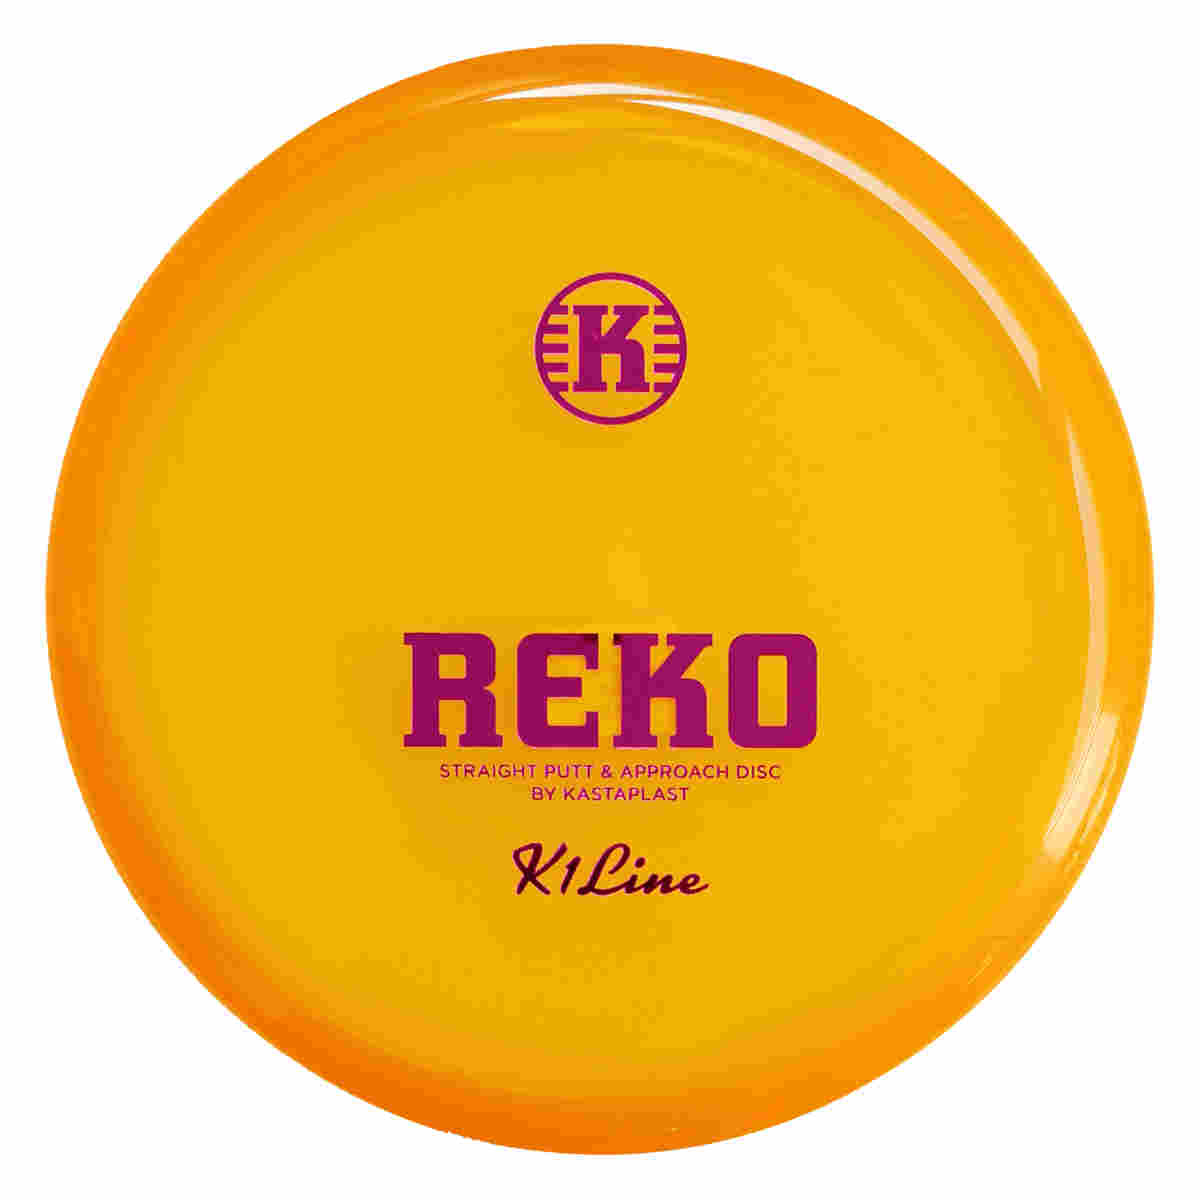 Kastaplast-Reko-K1 orange